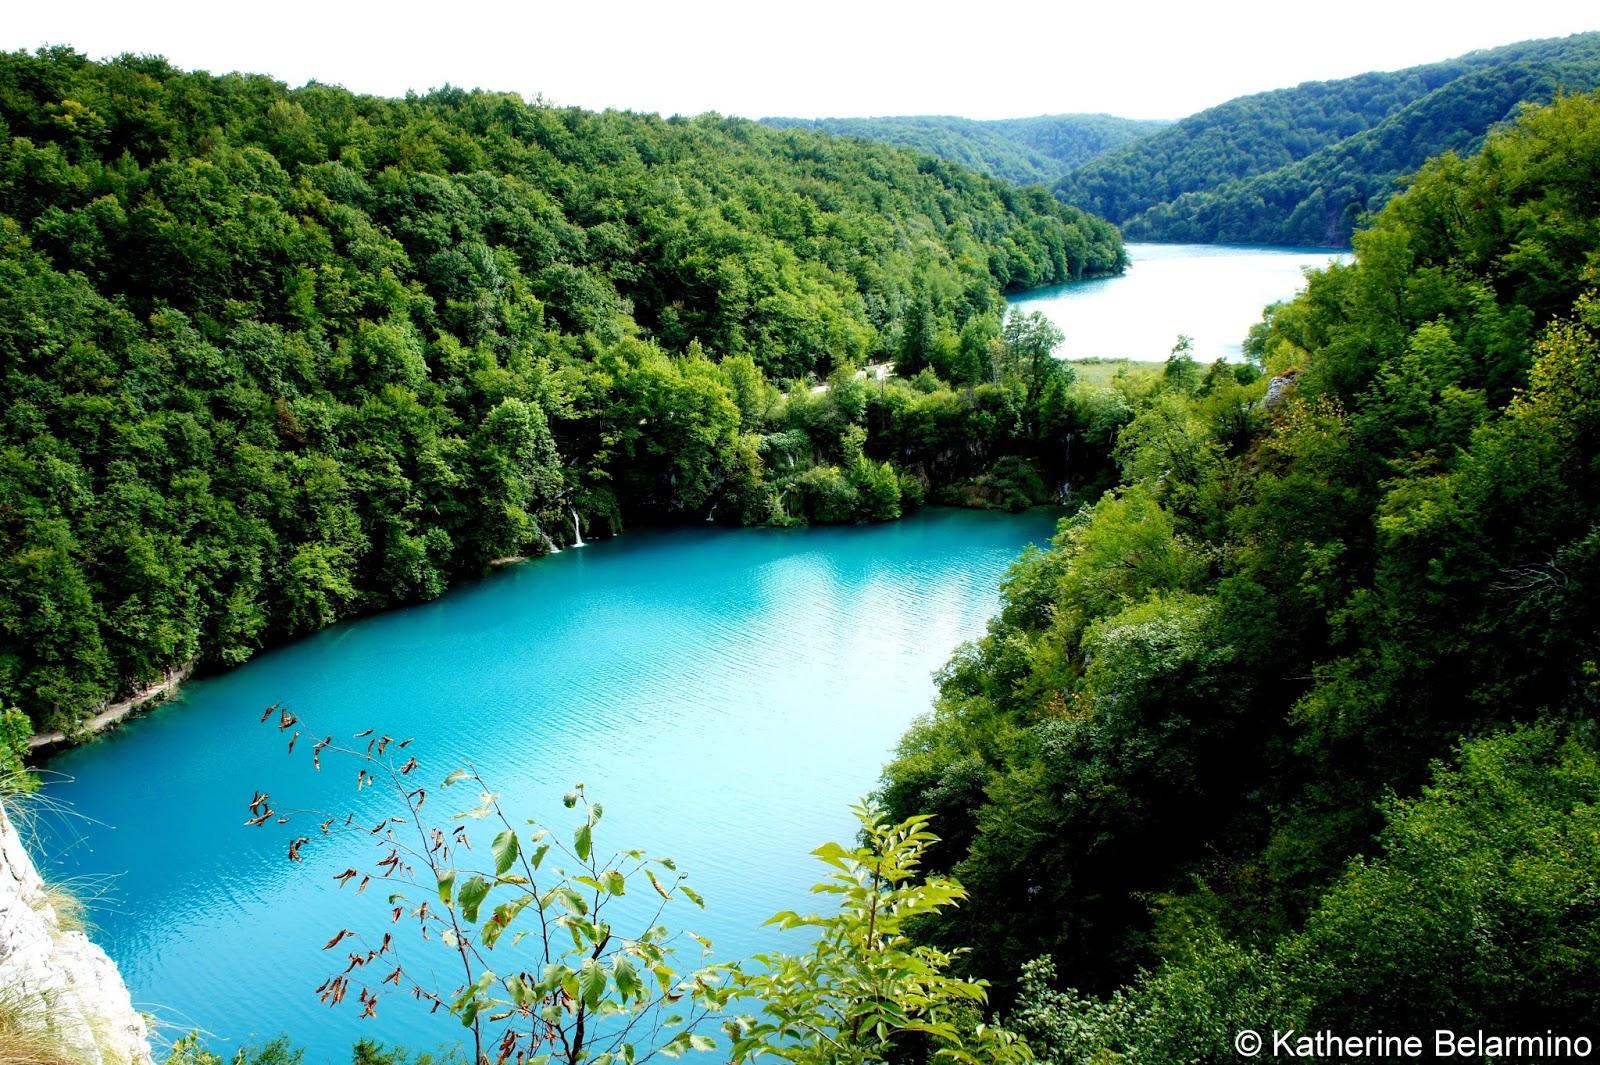 Croatia's Plitvicka Jezera (Plitvice Lakes) National Park ...